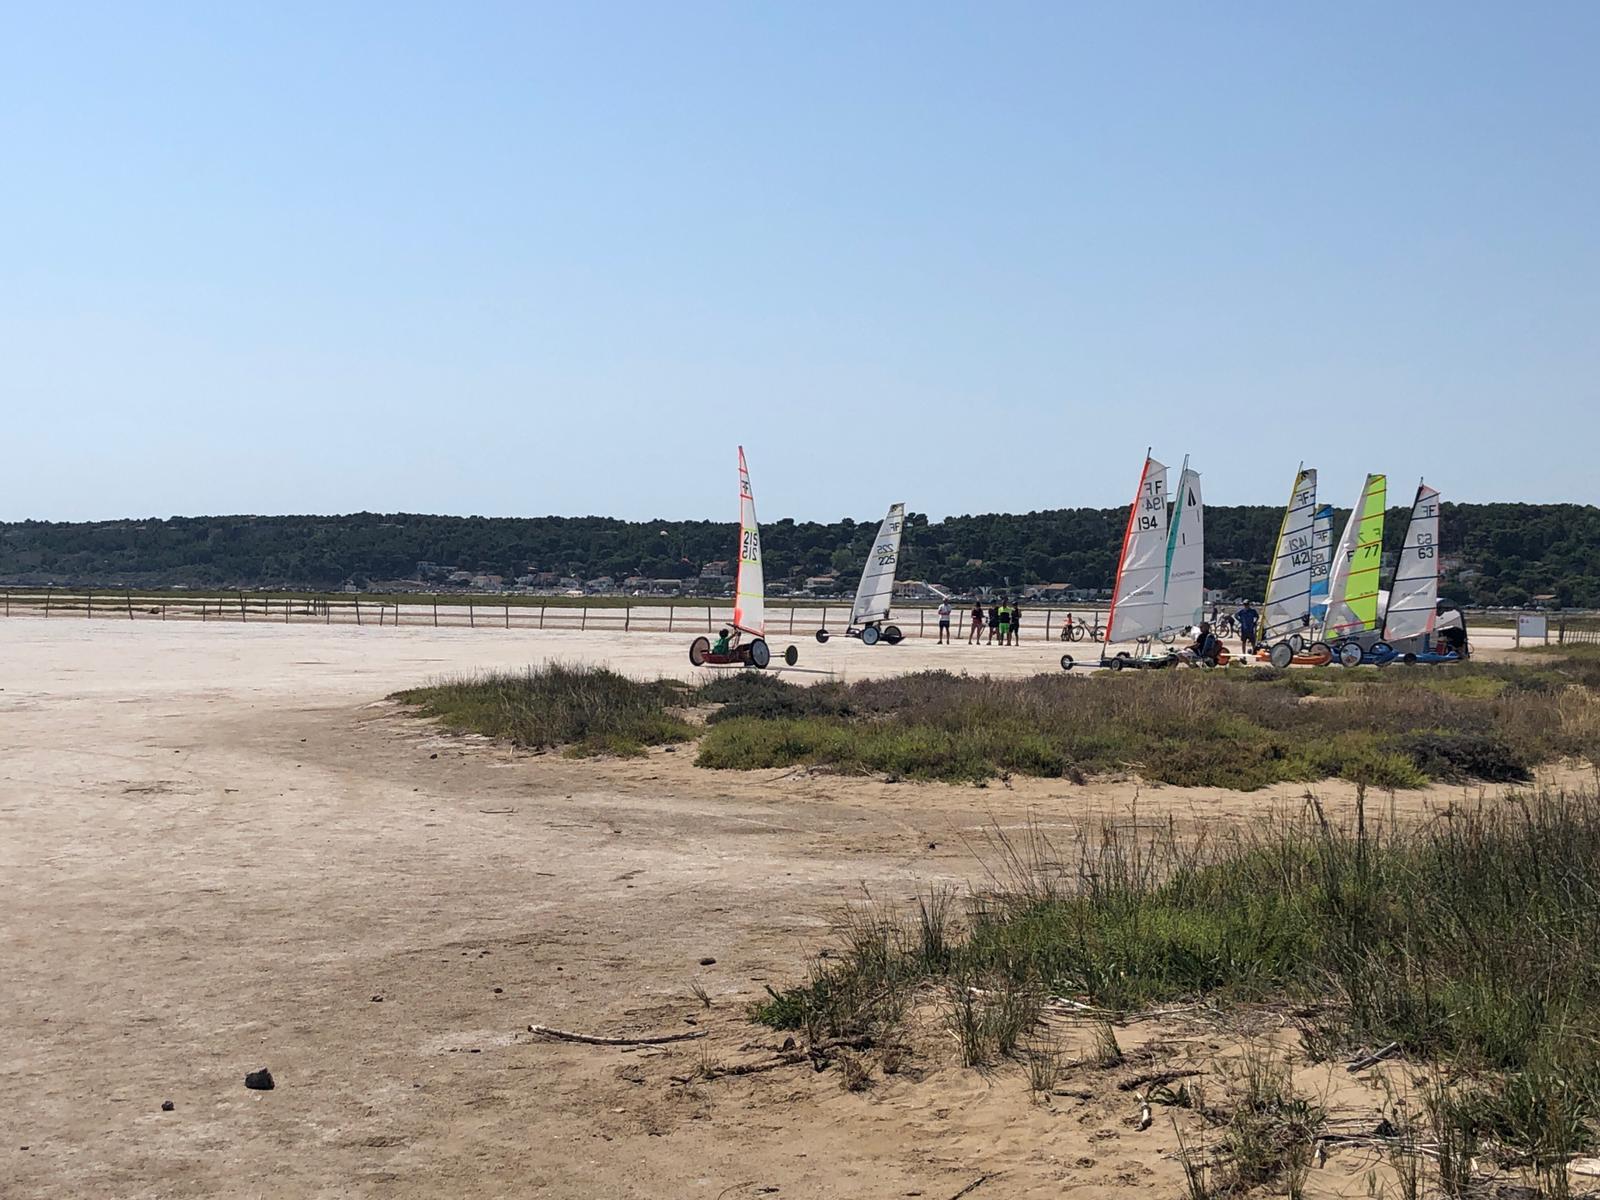 Kitesurfen - mijn verblijf op Domaine Presqu'île de la Franqui